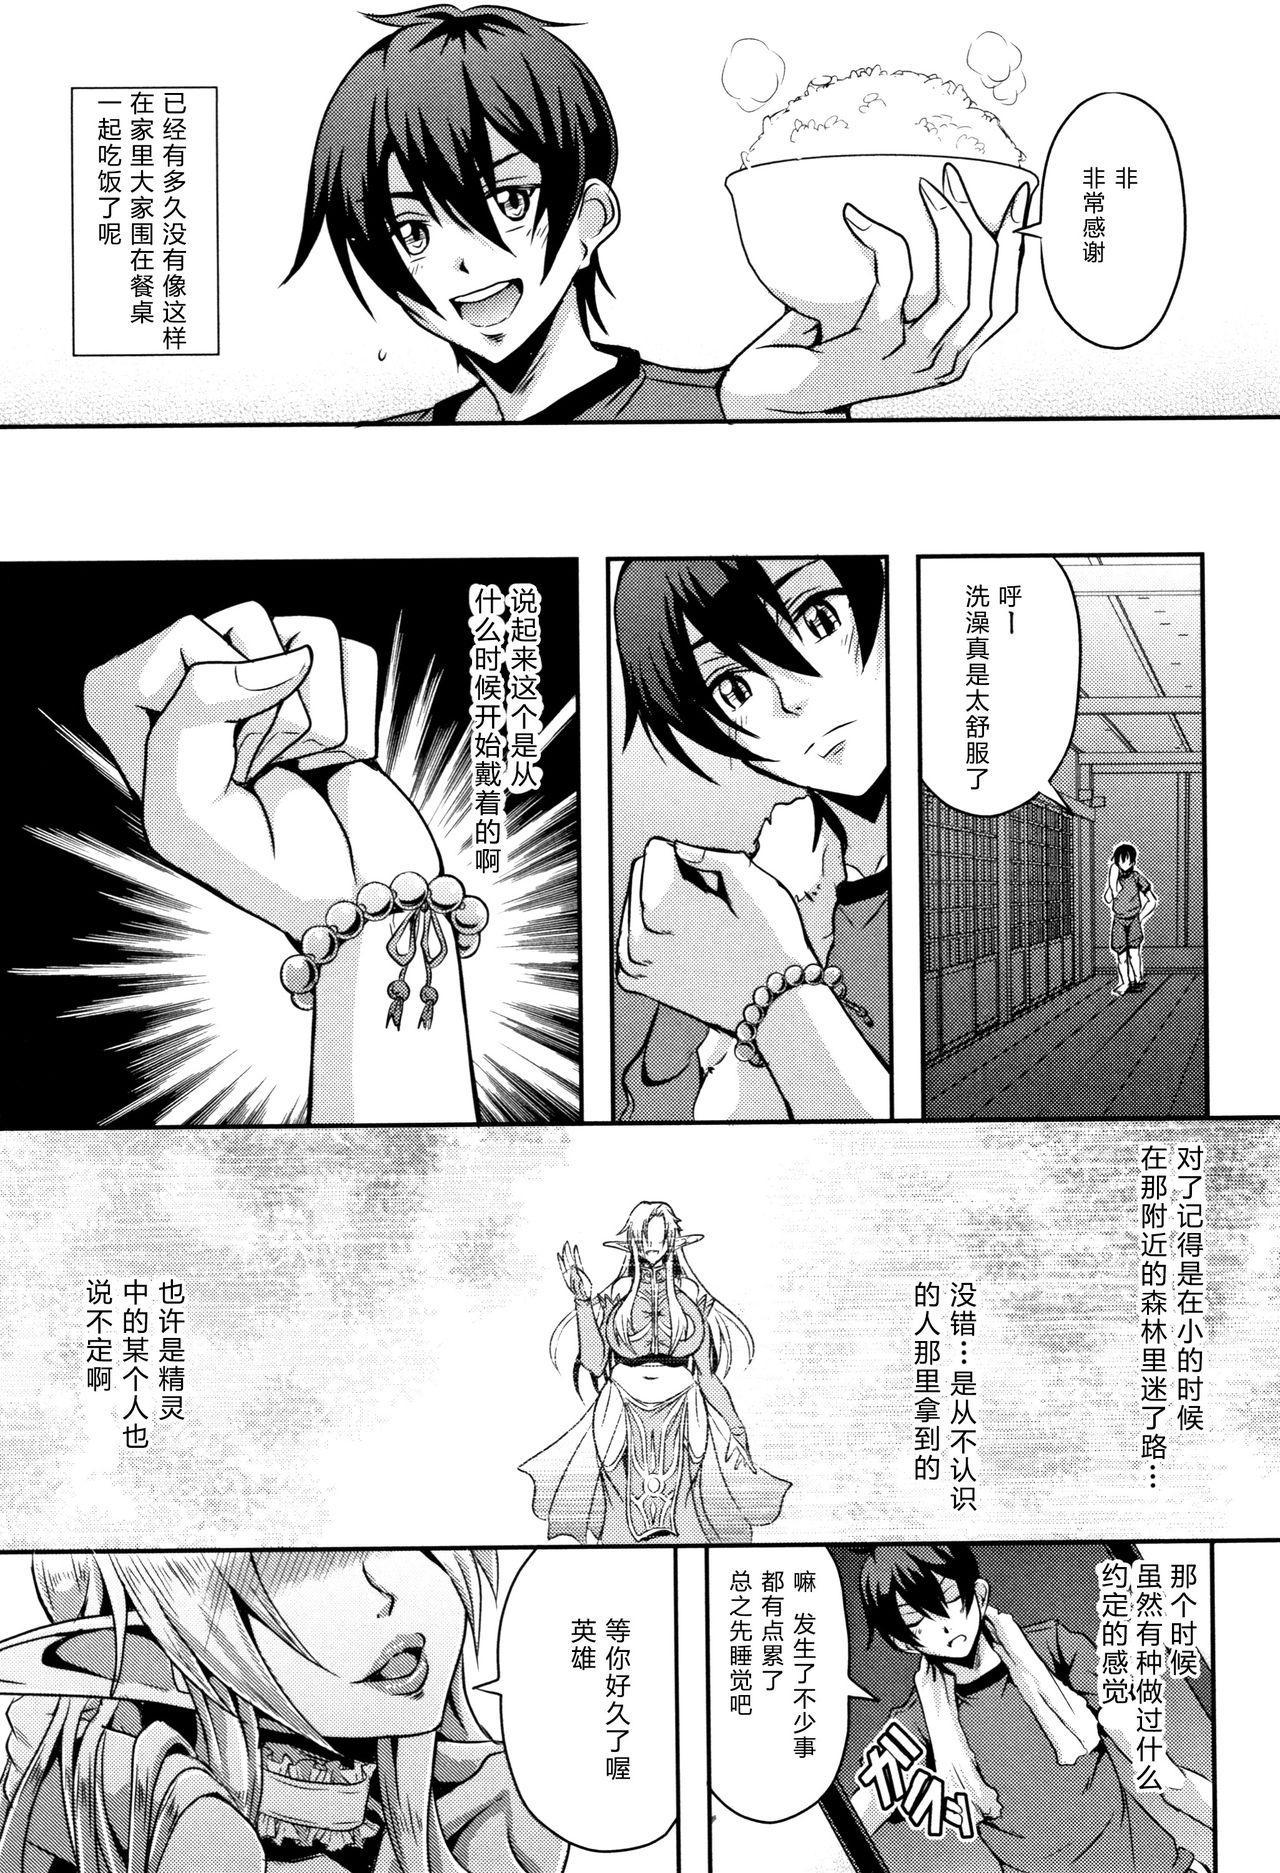 Elf Harem no Mori to Kozukuri Keiyaku | 妖精后宮生子契約 10